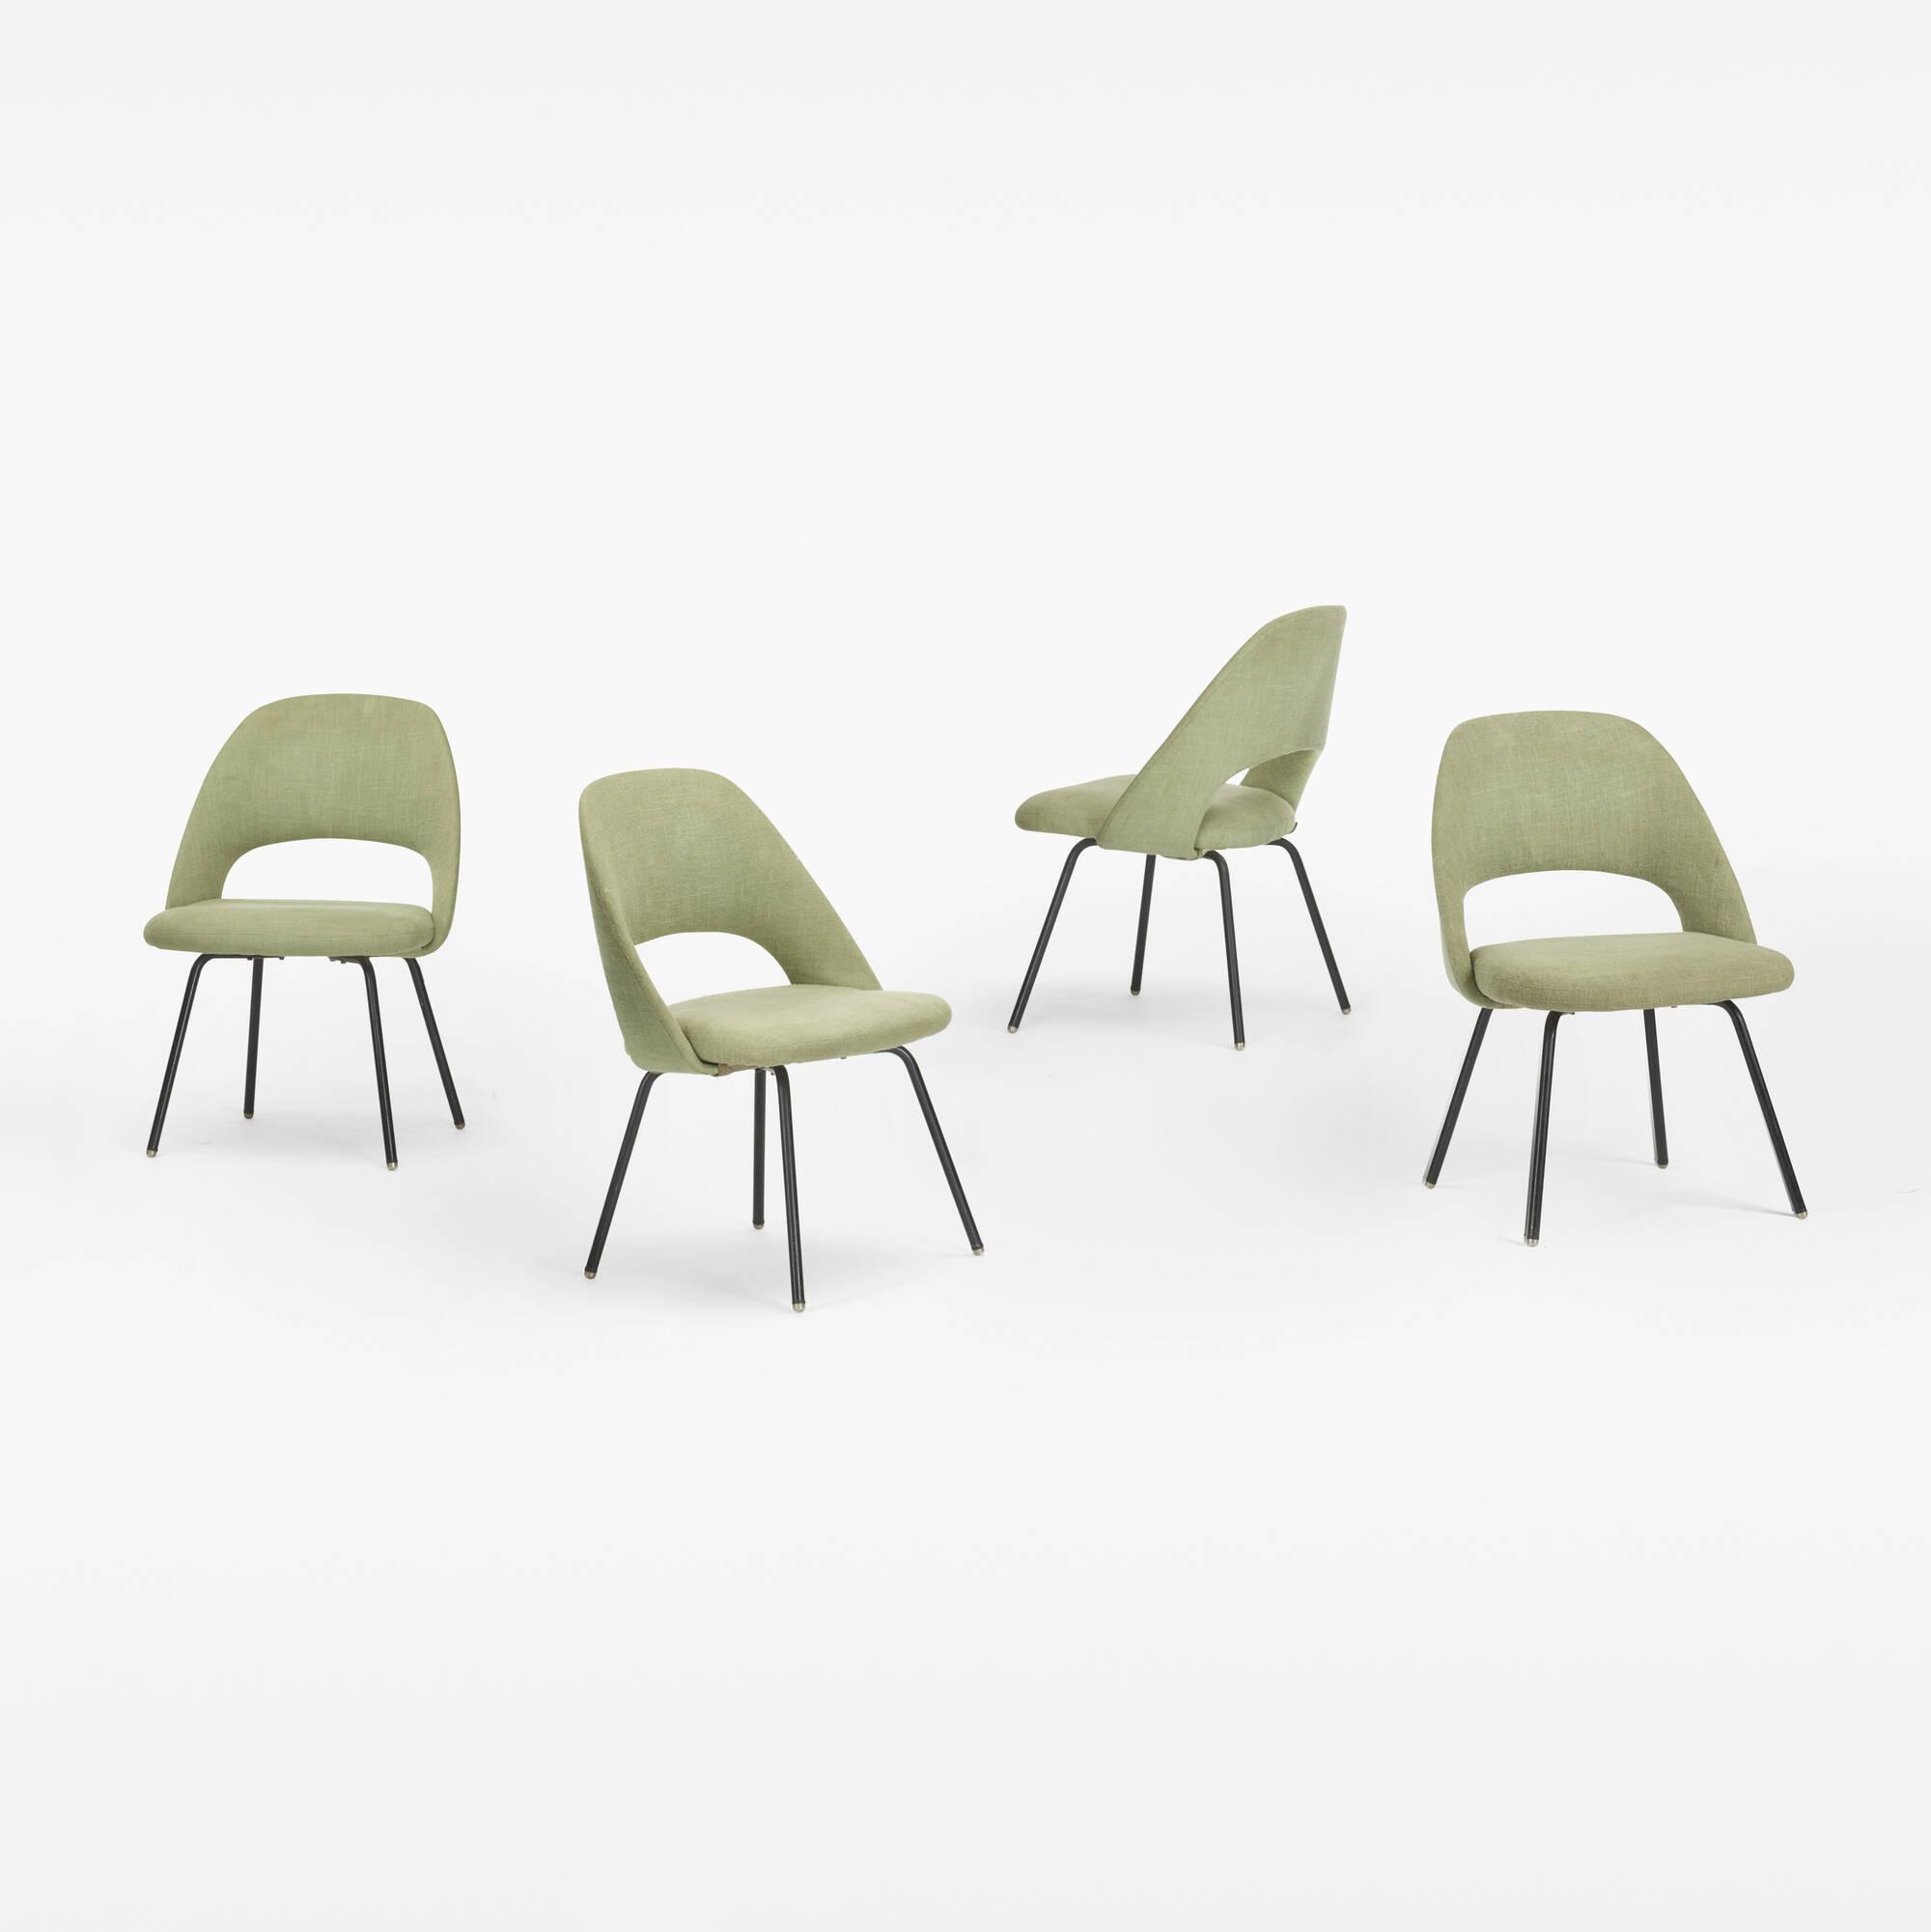 100 Saarinen Dining Chairs Used Marble Top Dining  : 5542massmodernday2august2017eerosaarinendiningchairssetoffourwrightauction from jojogor.com size 2000 x 2001 jpeg 429kB